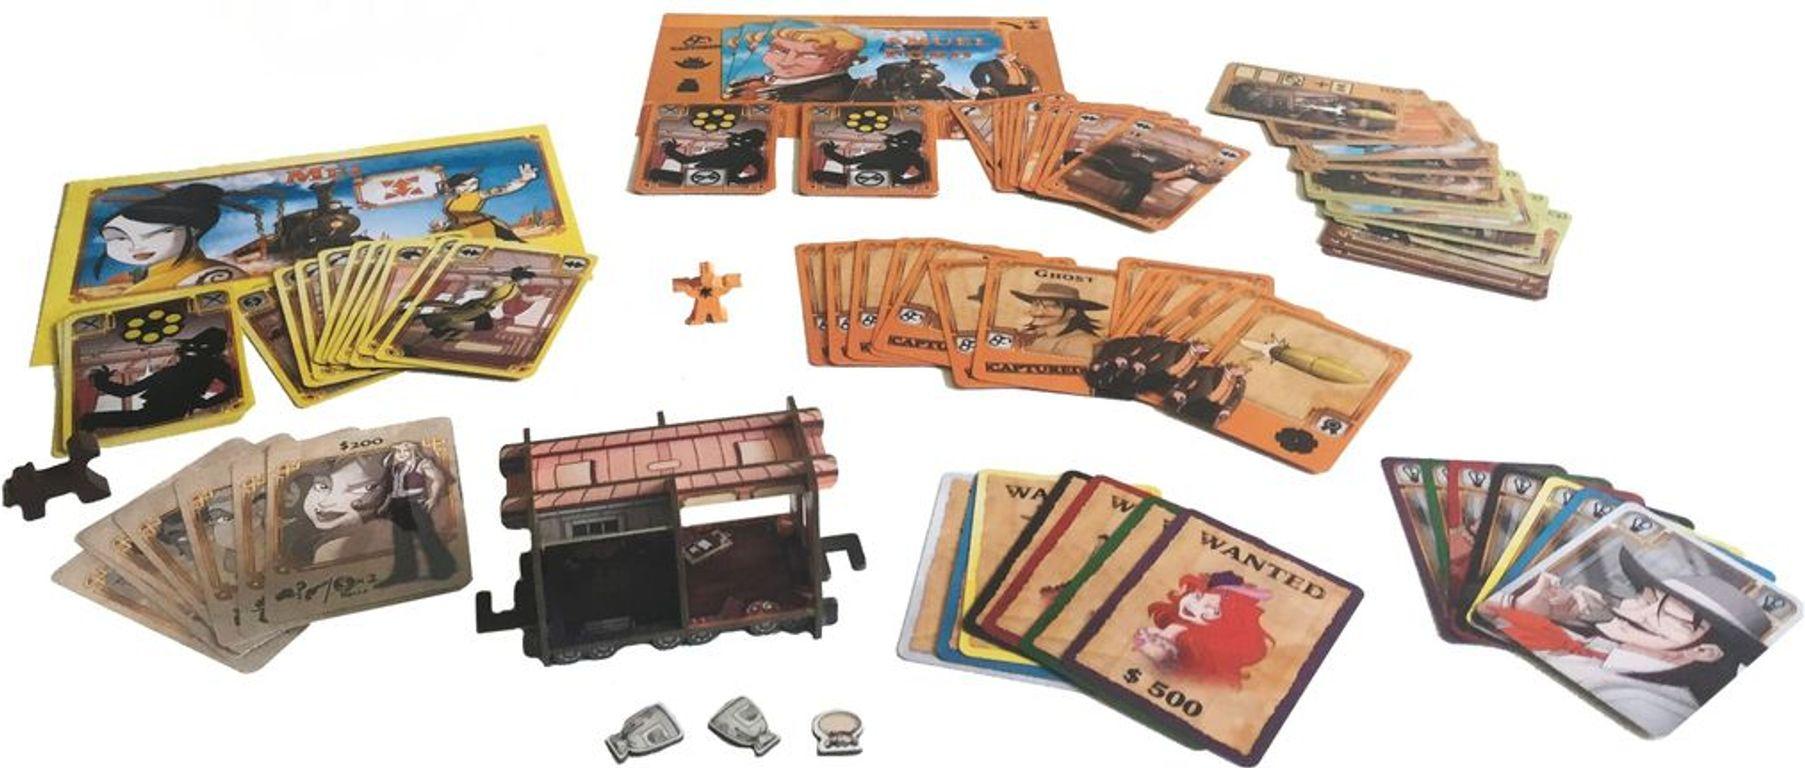 Colt Express: Marshal & Prisoners components